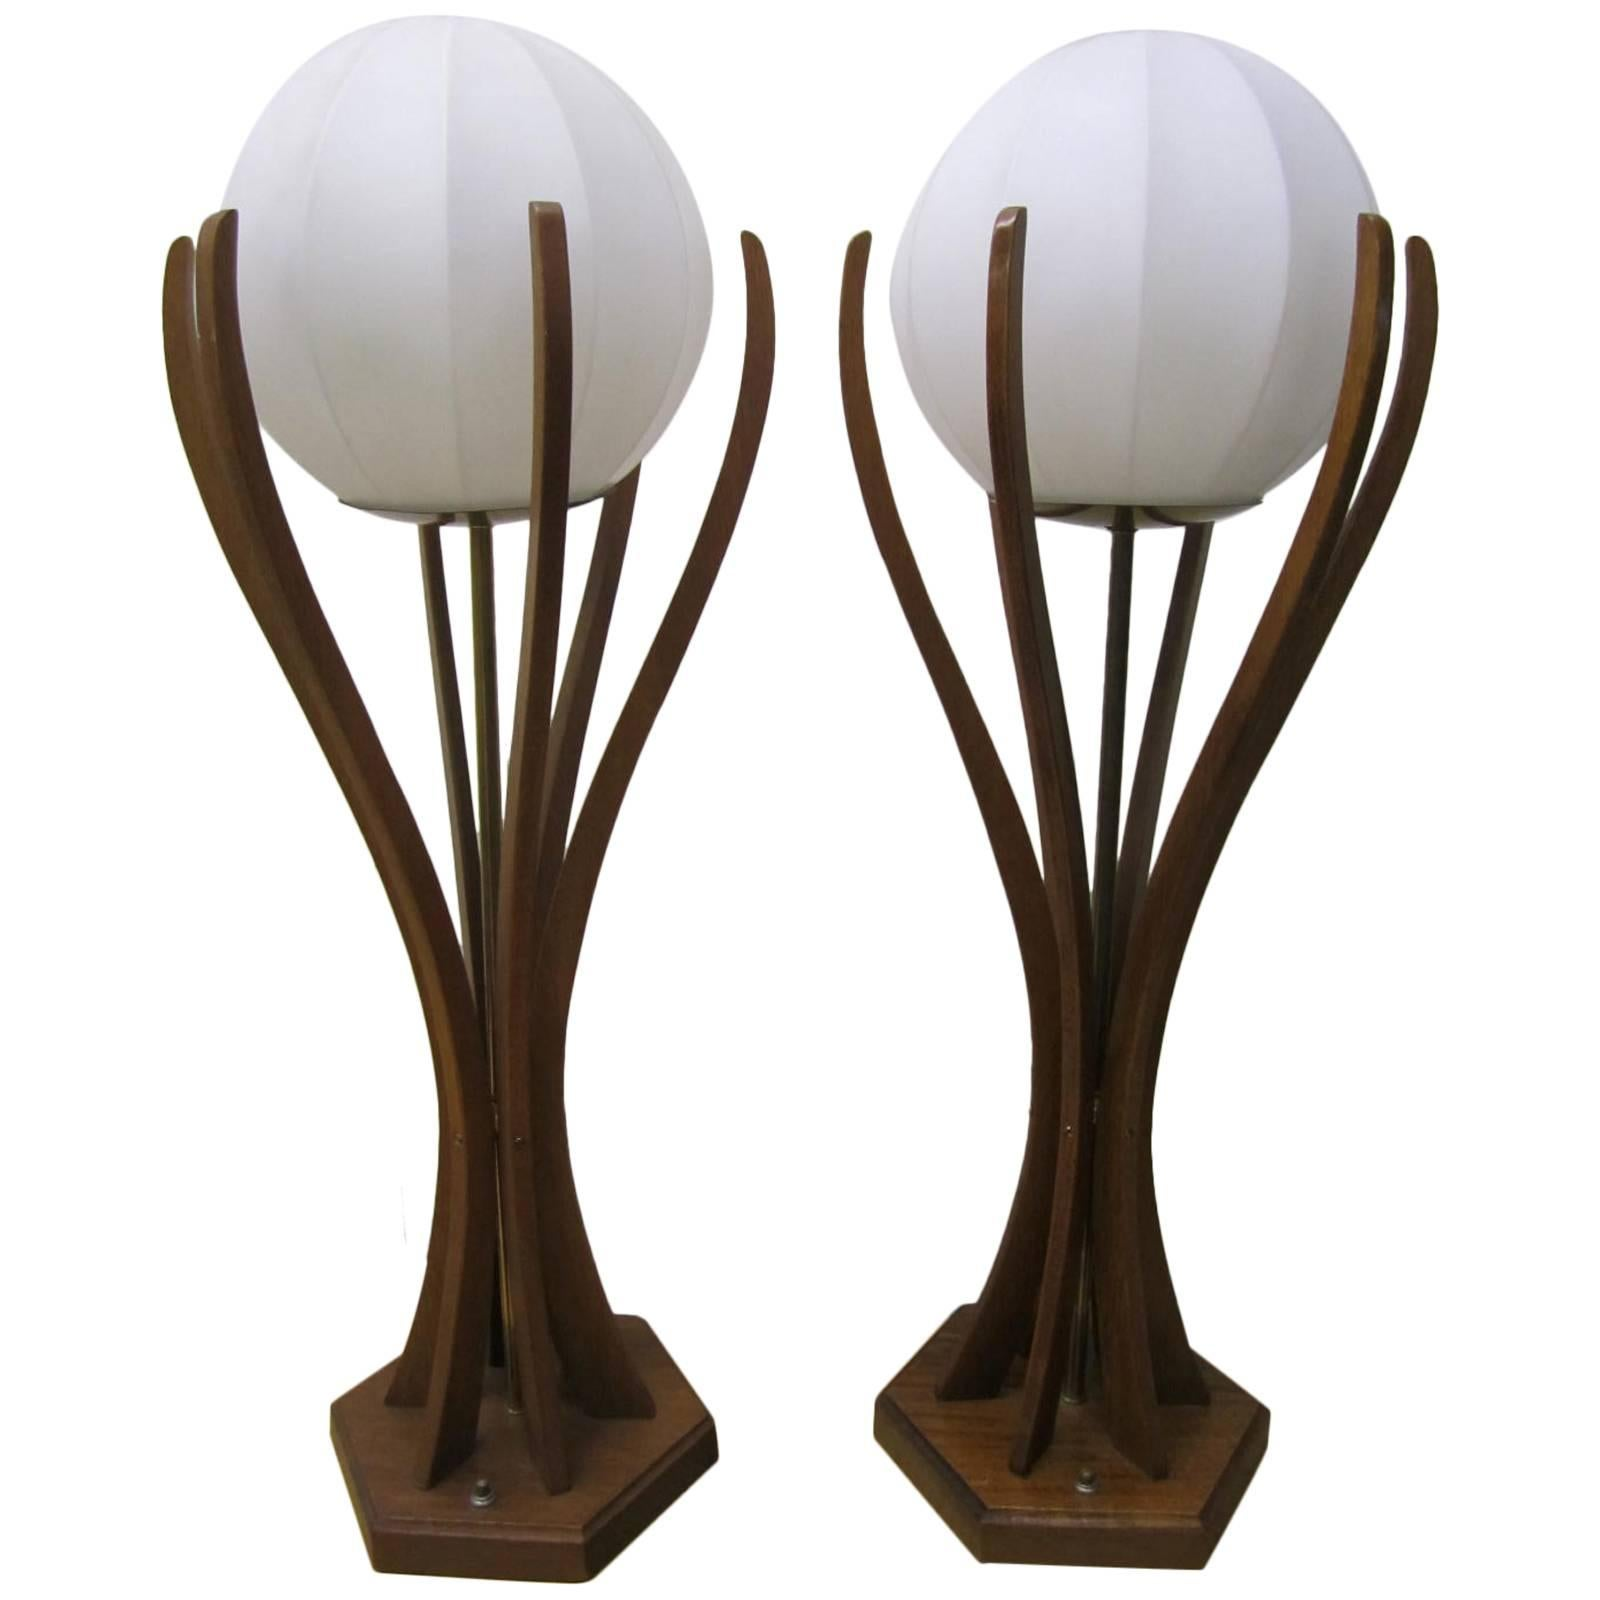 Excellent Pair of Danish Modern Sculptural Walnut Lamps Mid-Century Modern